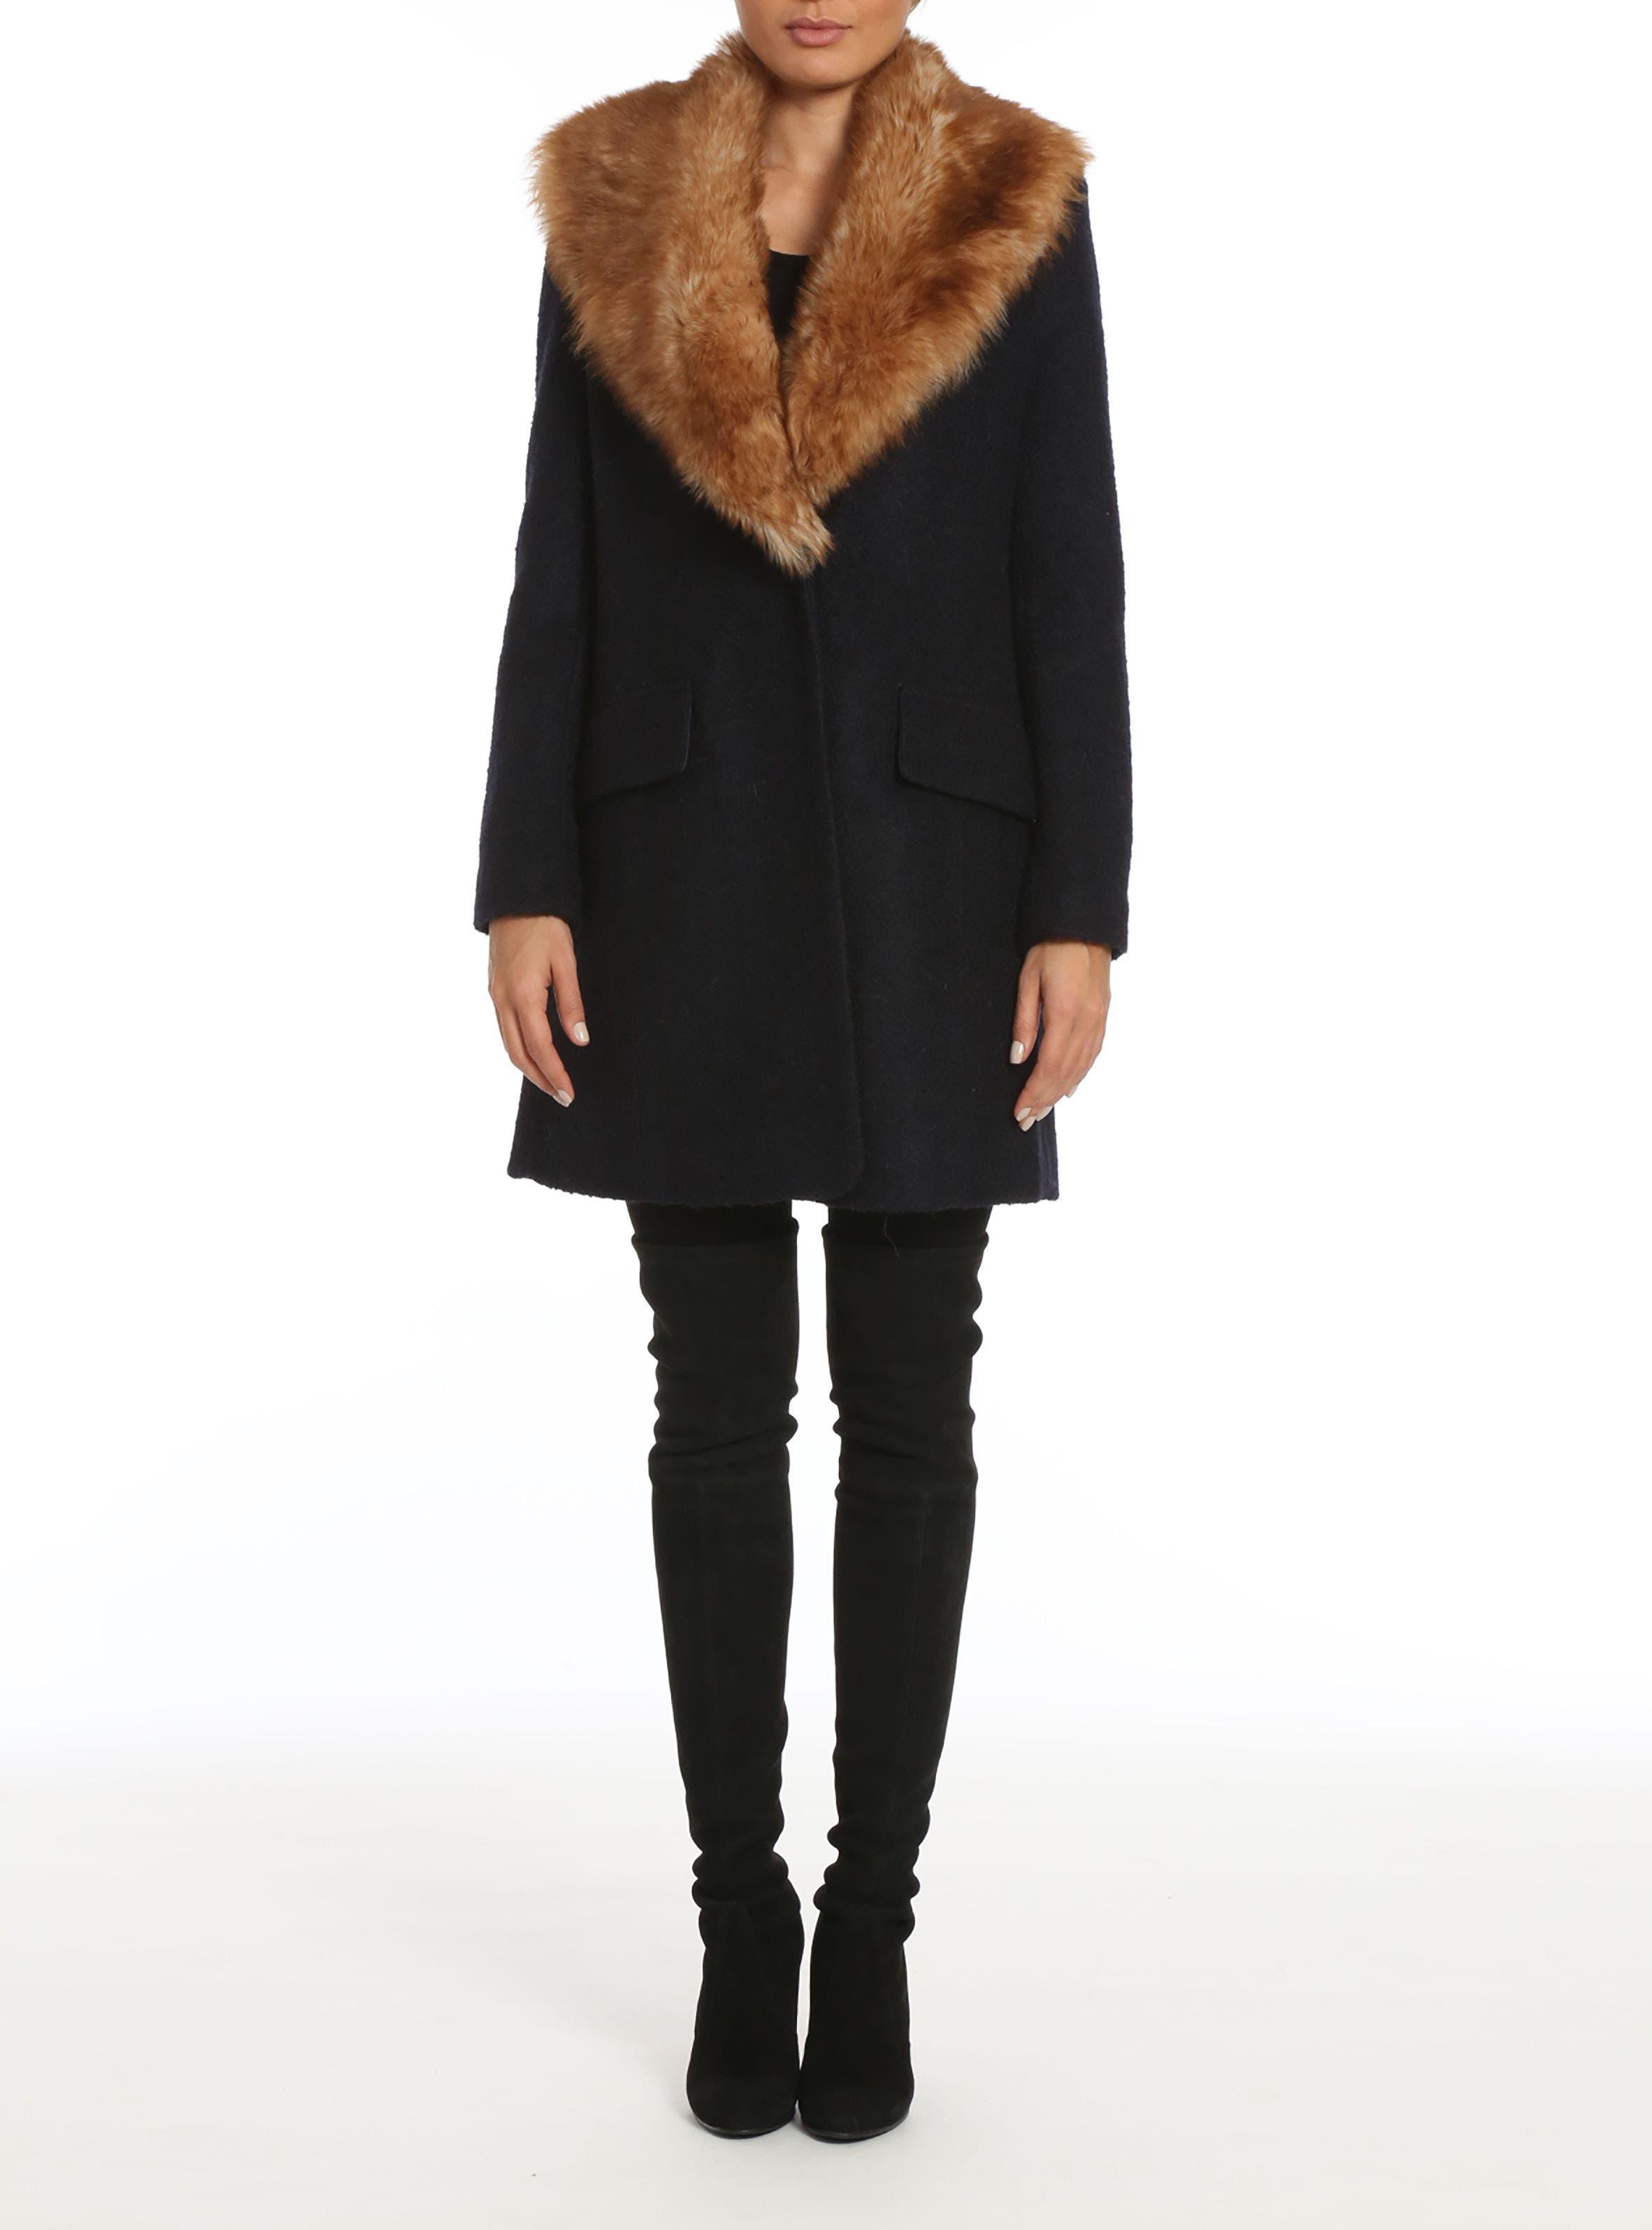 Main Image - Belle Badgley Mischka 'Holly' Faux Fur Collar Bouclé Coat